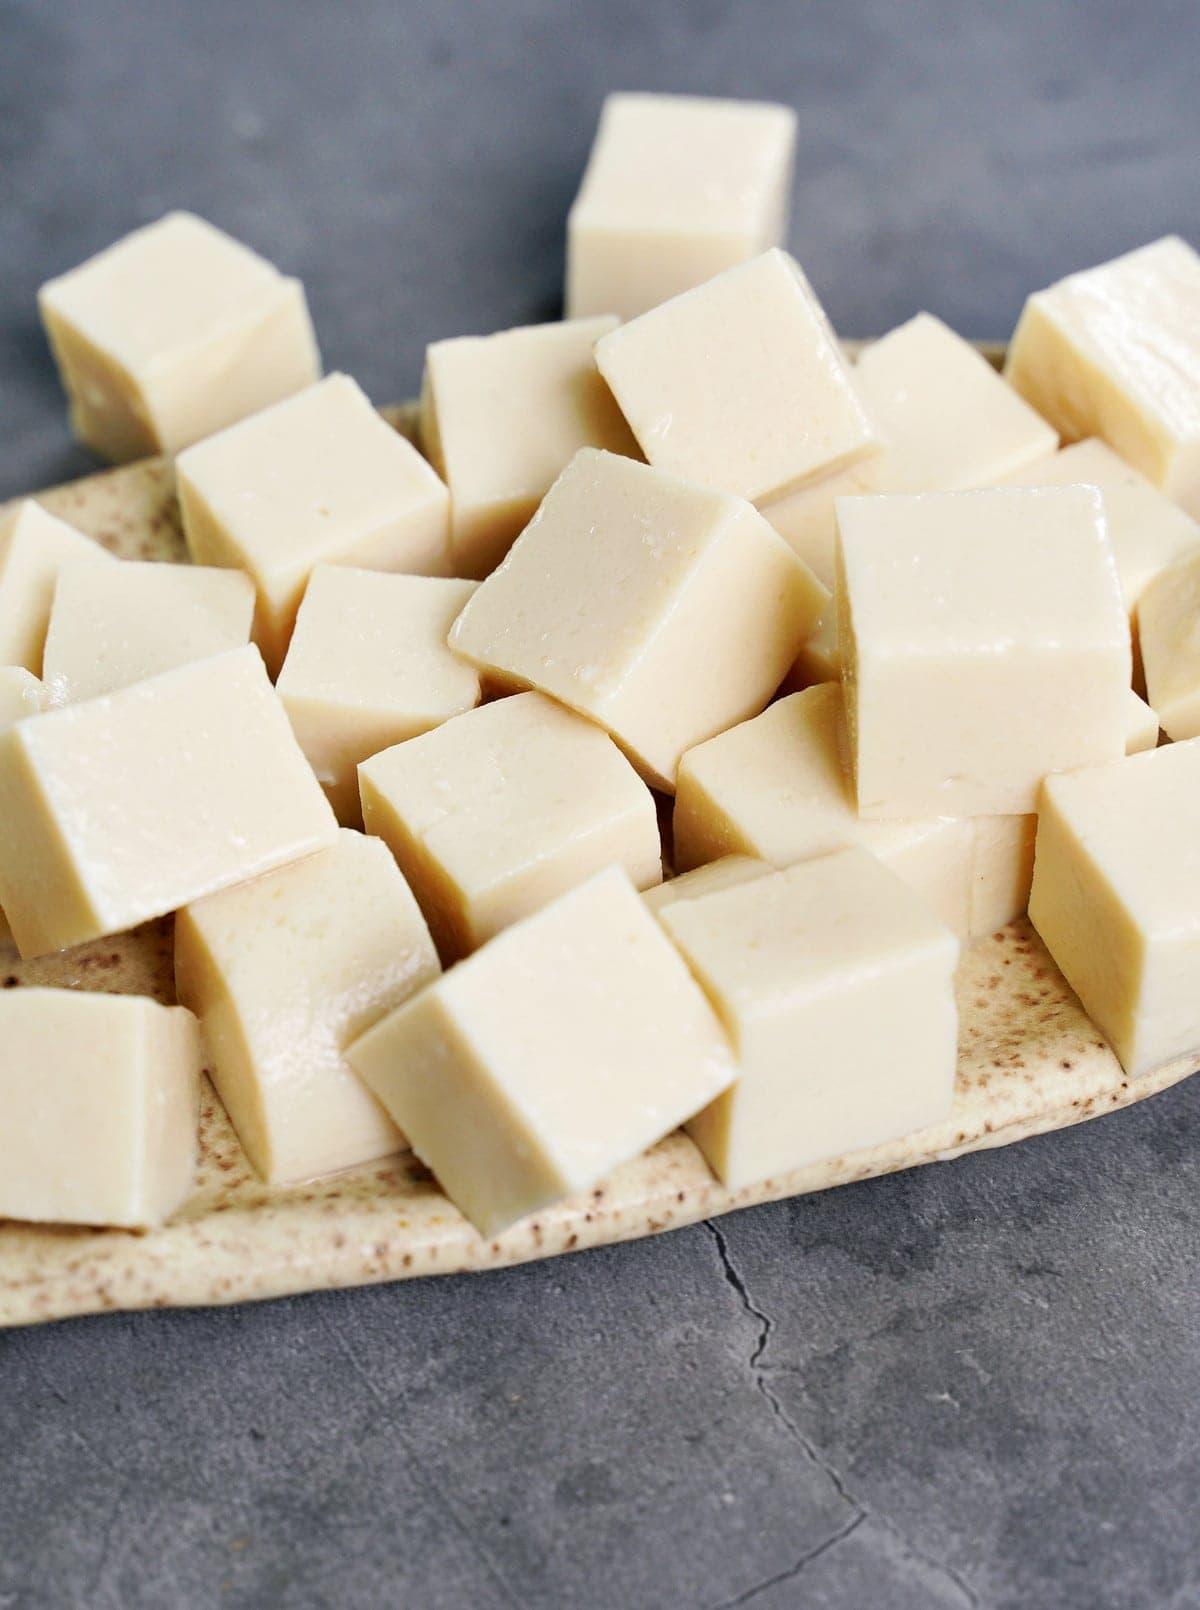 close-up of homemade white silken tofu cubes